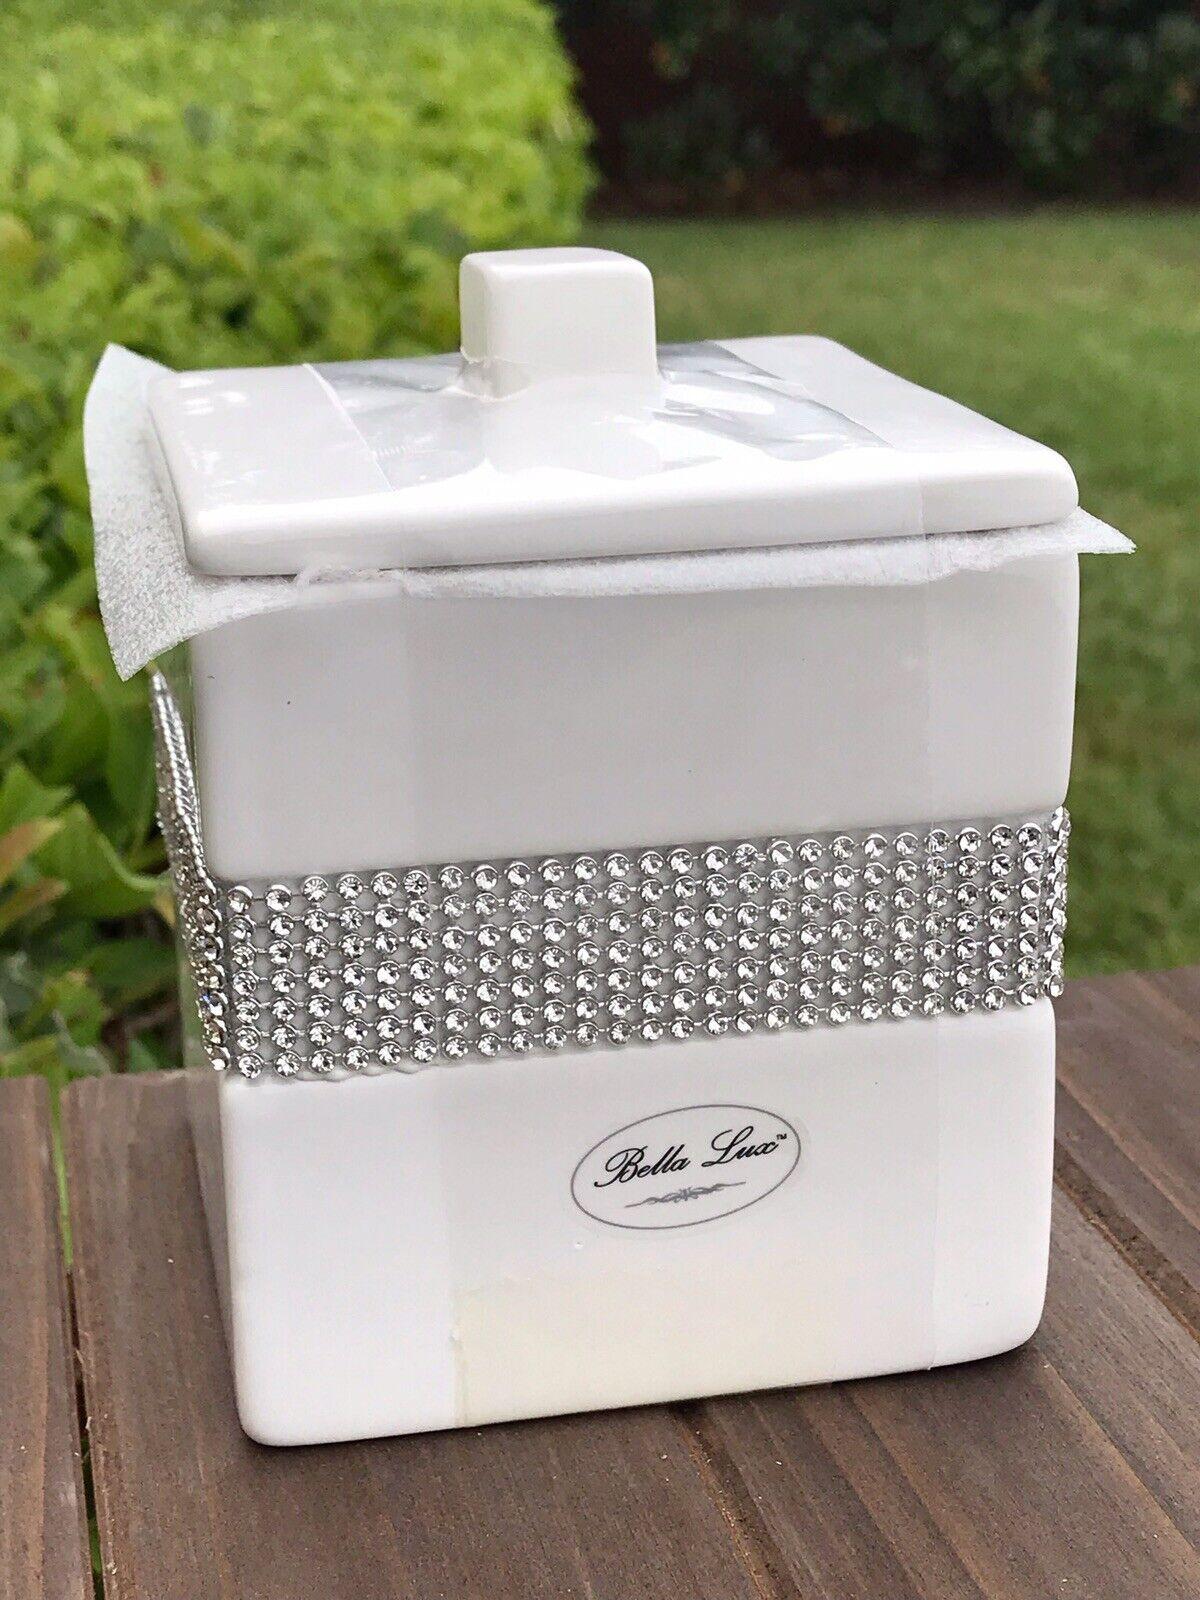 Bella Lux Rhinestone Square Weiß Apothecary Jar Crystal Bathroom Home Decor New